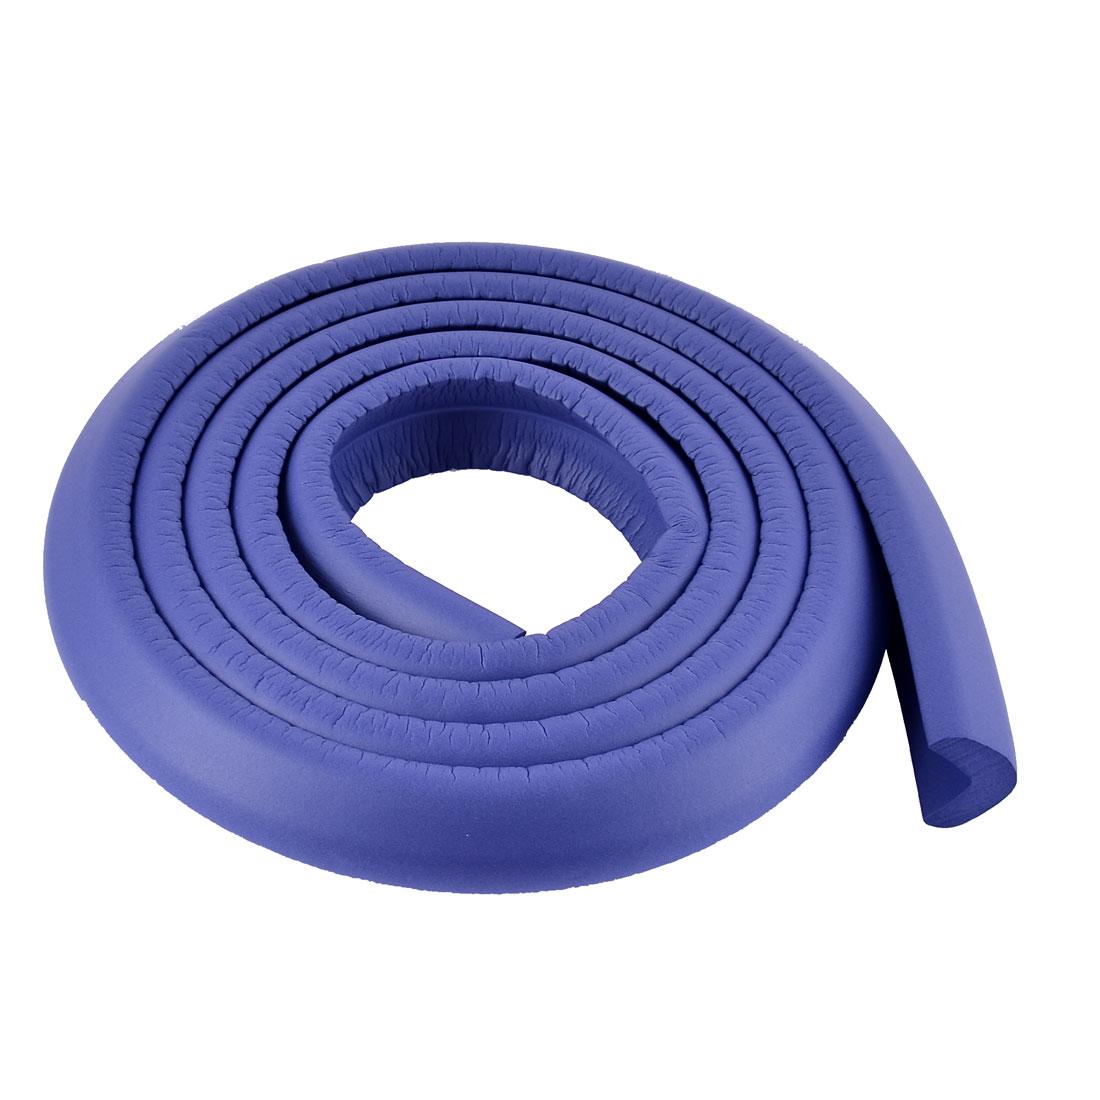 Furniture Table Corner Edge Softner Guard Protector Cushion 2M Long Blue